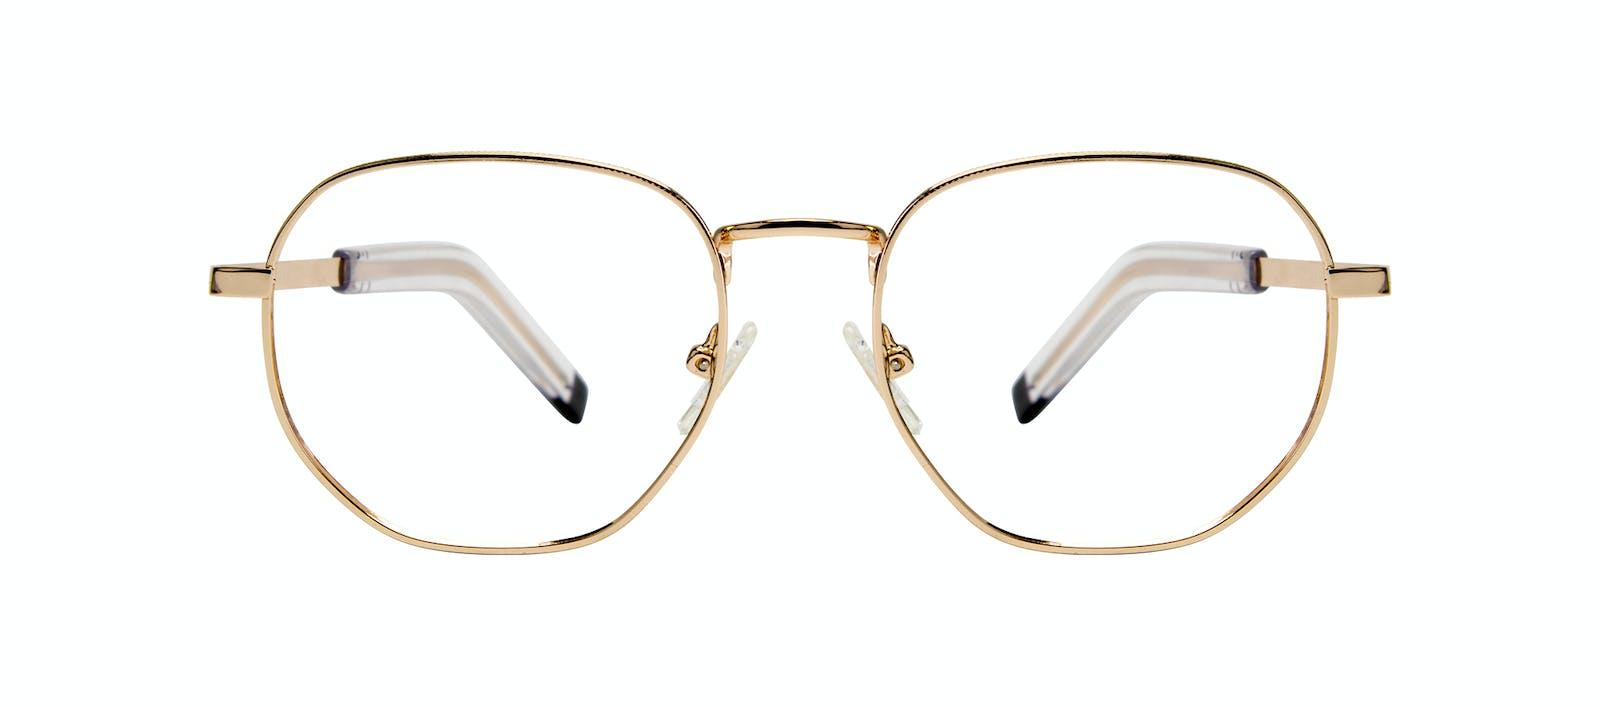 19975ed2b8 Affordable Fashion Glasses Round Eyeglasses Men Rise Gold Front